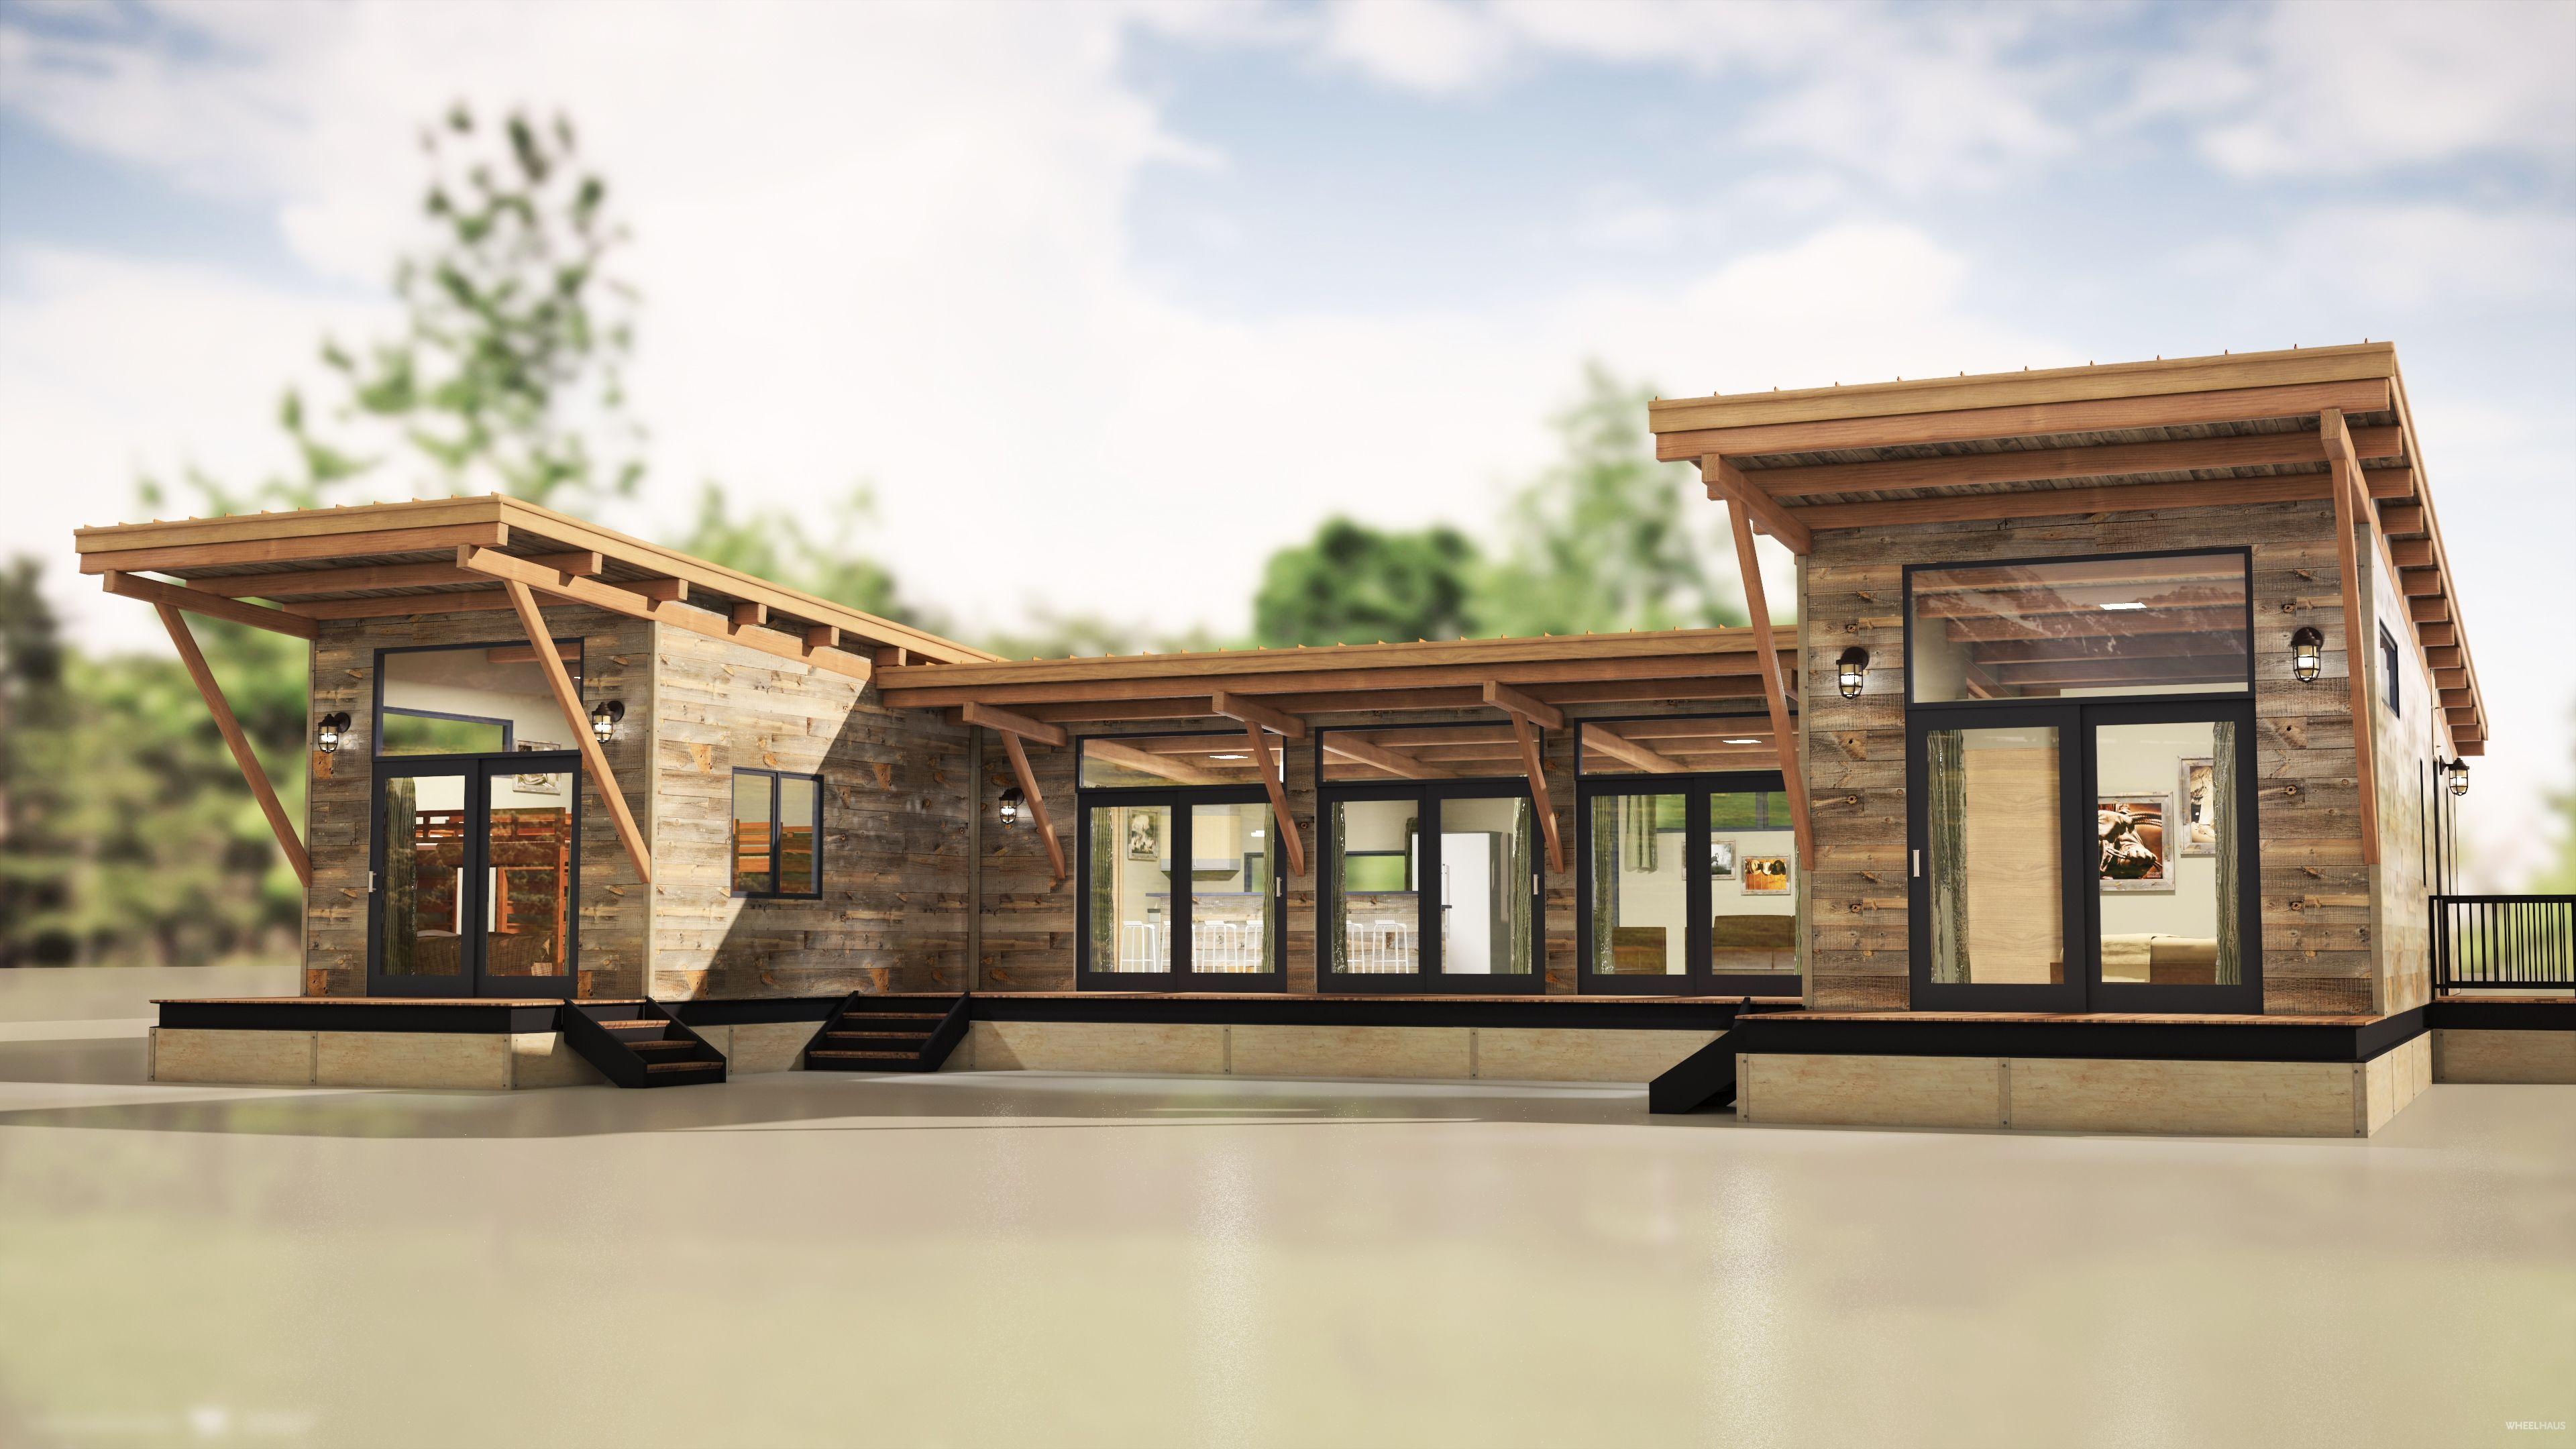 the hitch haus 1500 is our original multi unit modular home similar